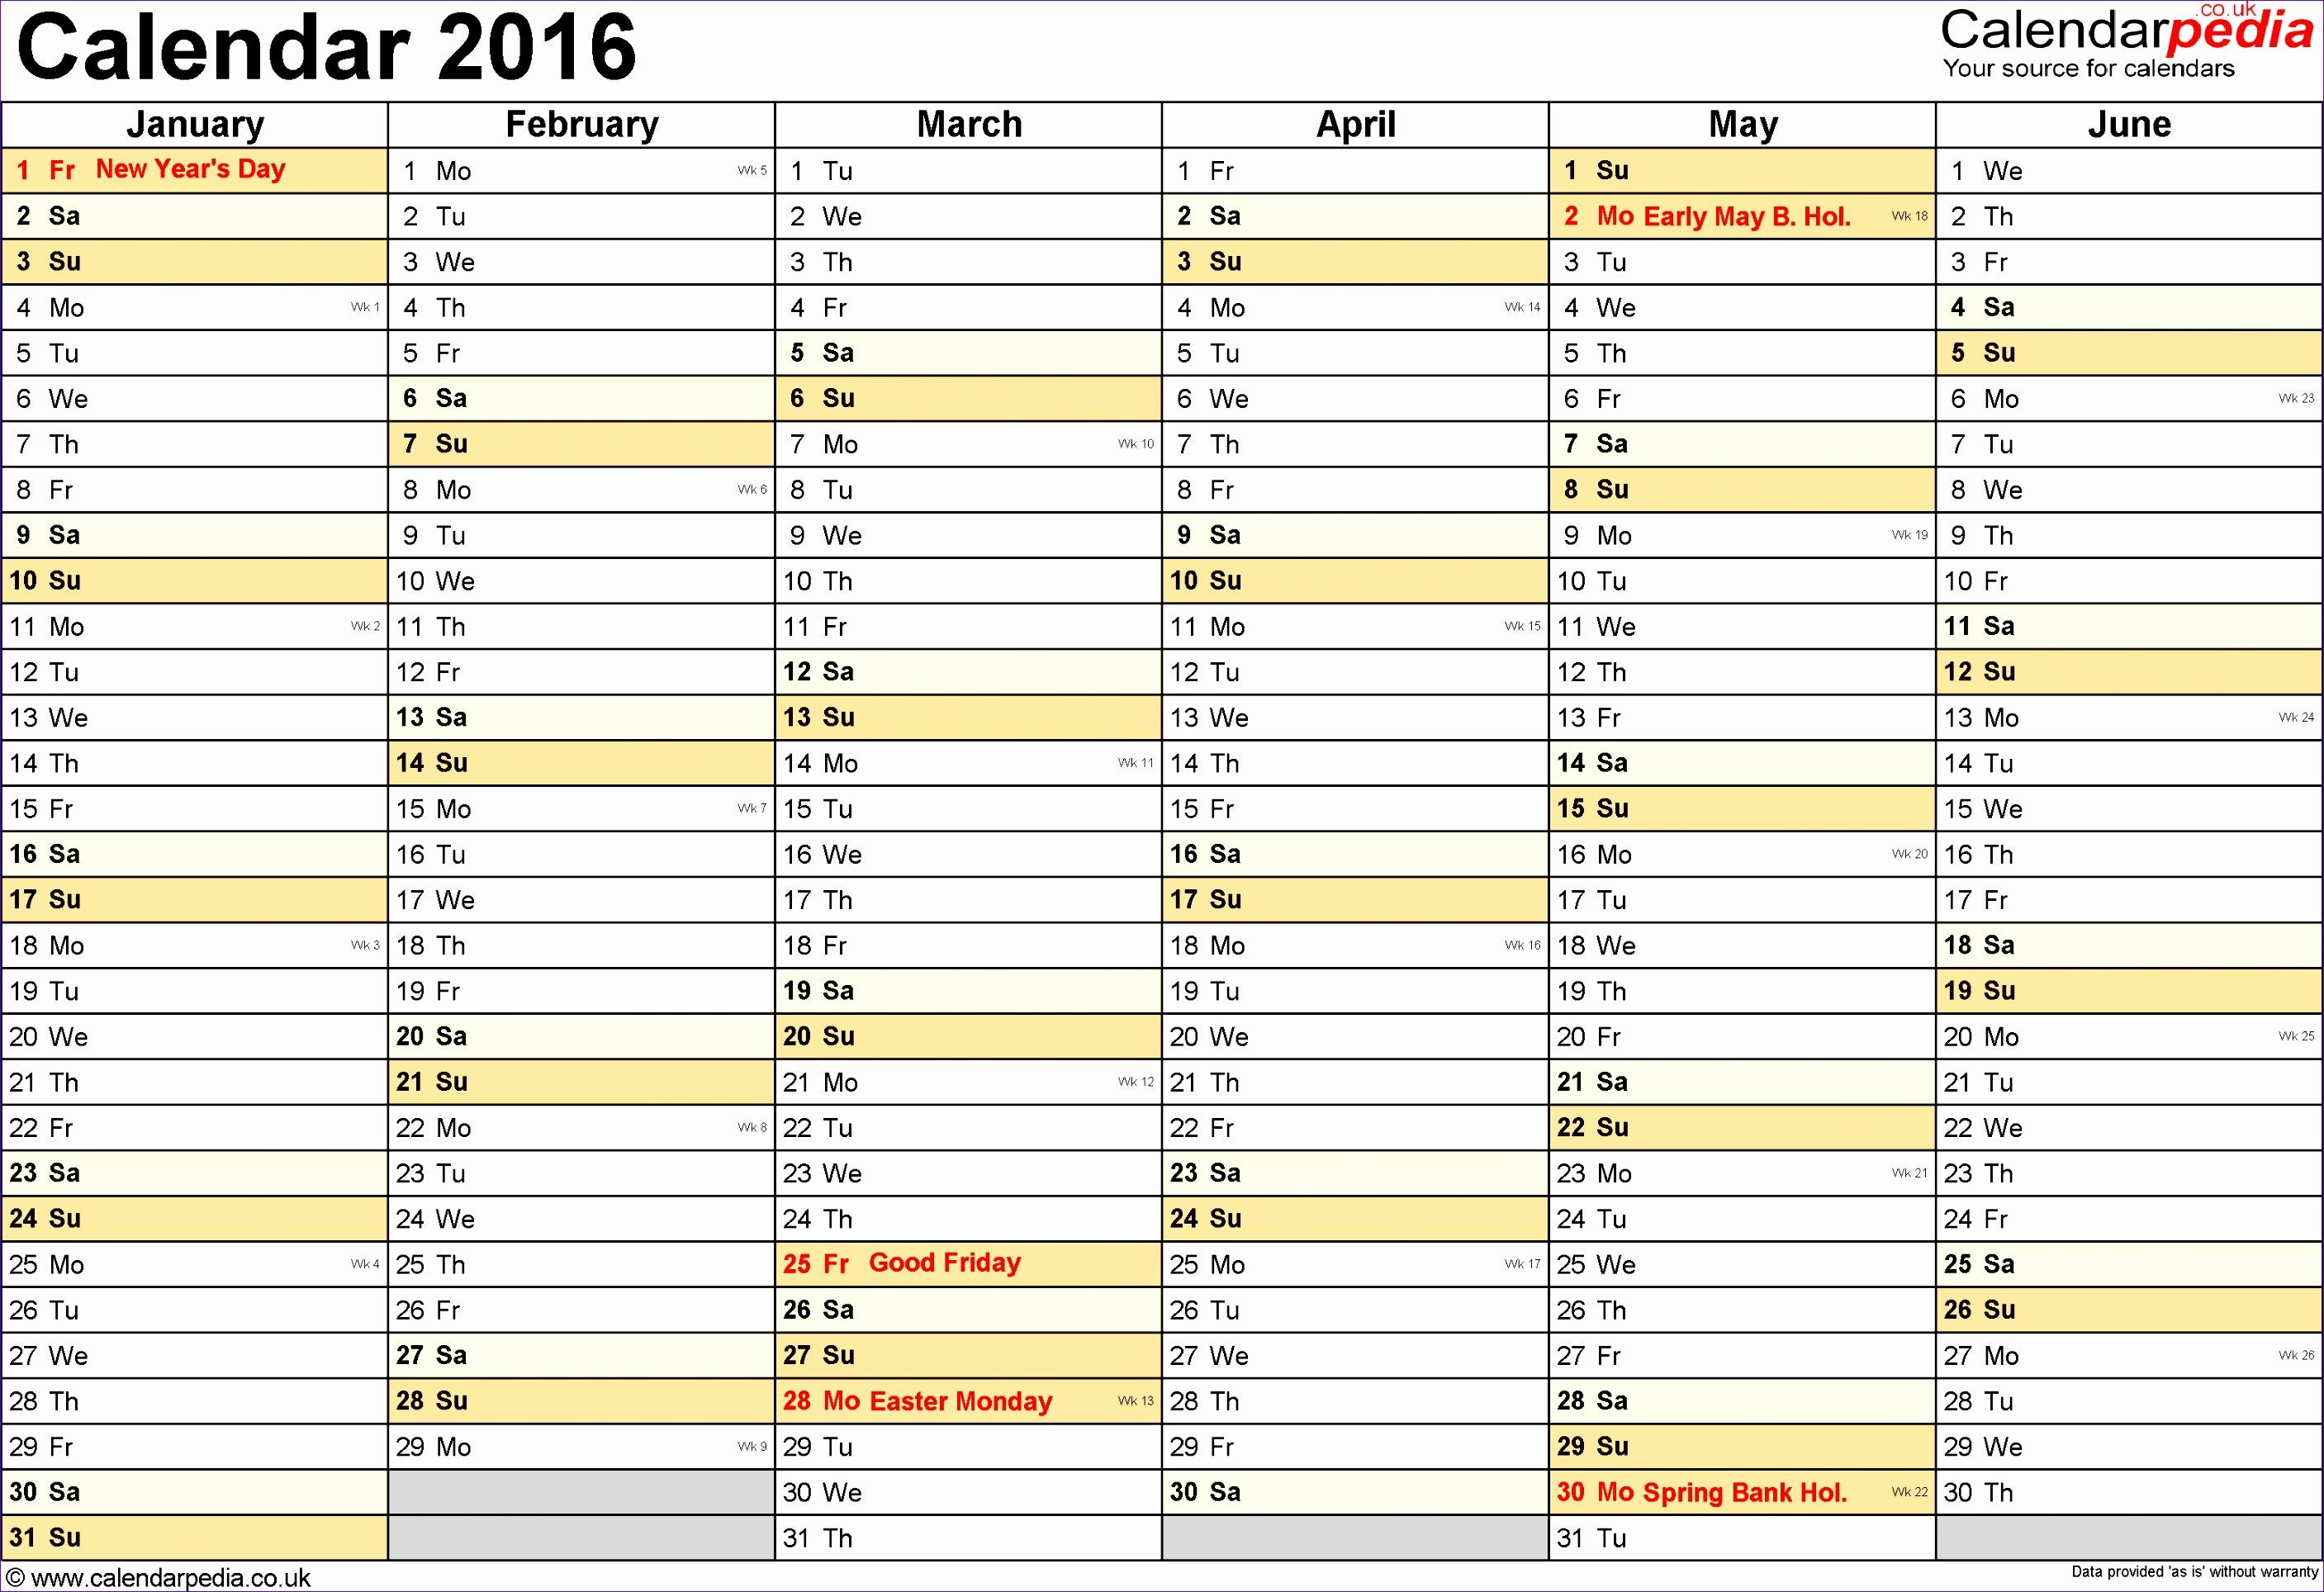 Holiday Itinerary Template Excel Kkrjl Inspirational Excel Calendar 2016 Uk 16 Printable Templates Xls Xlsx Free